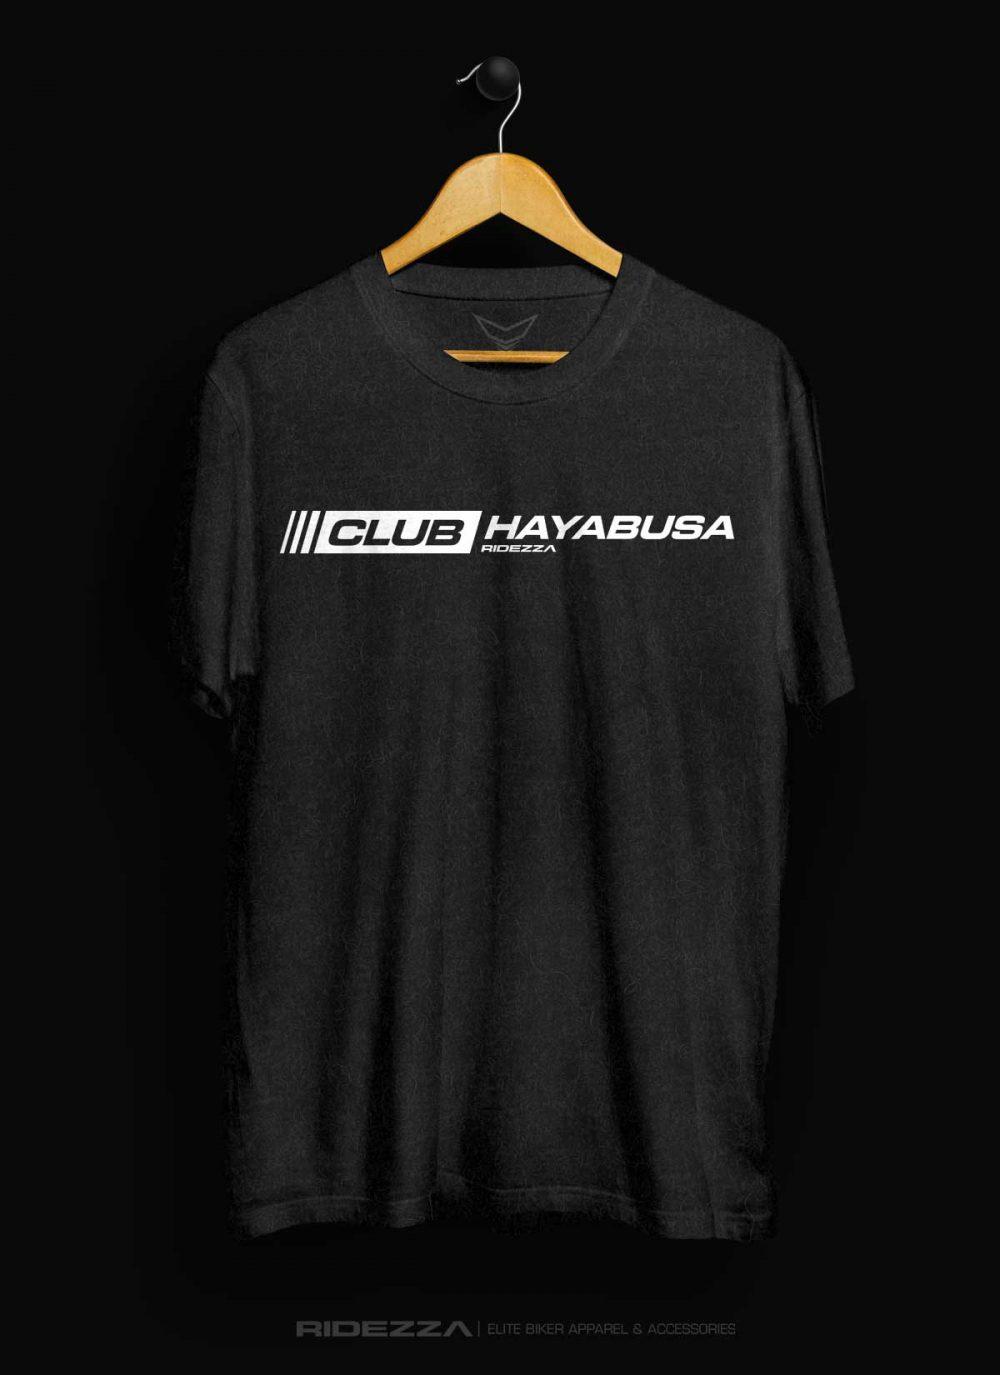 Suzuki Hayabusa Club T-Shirt